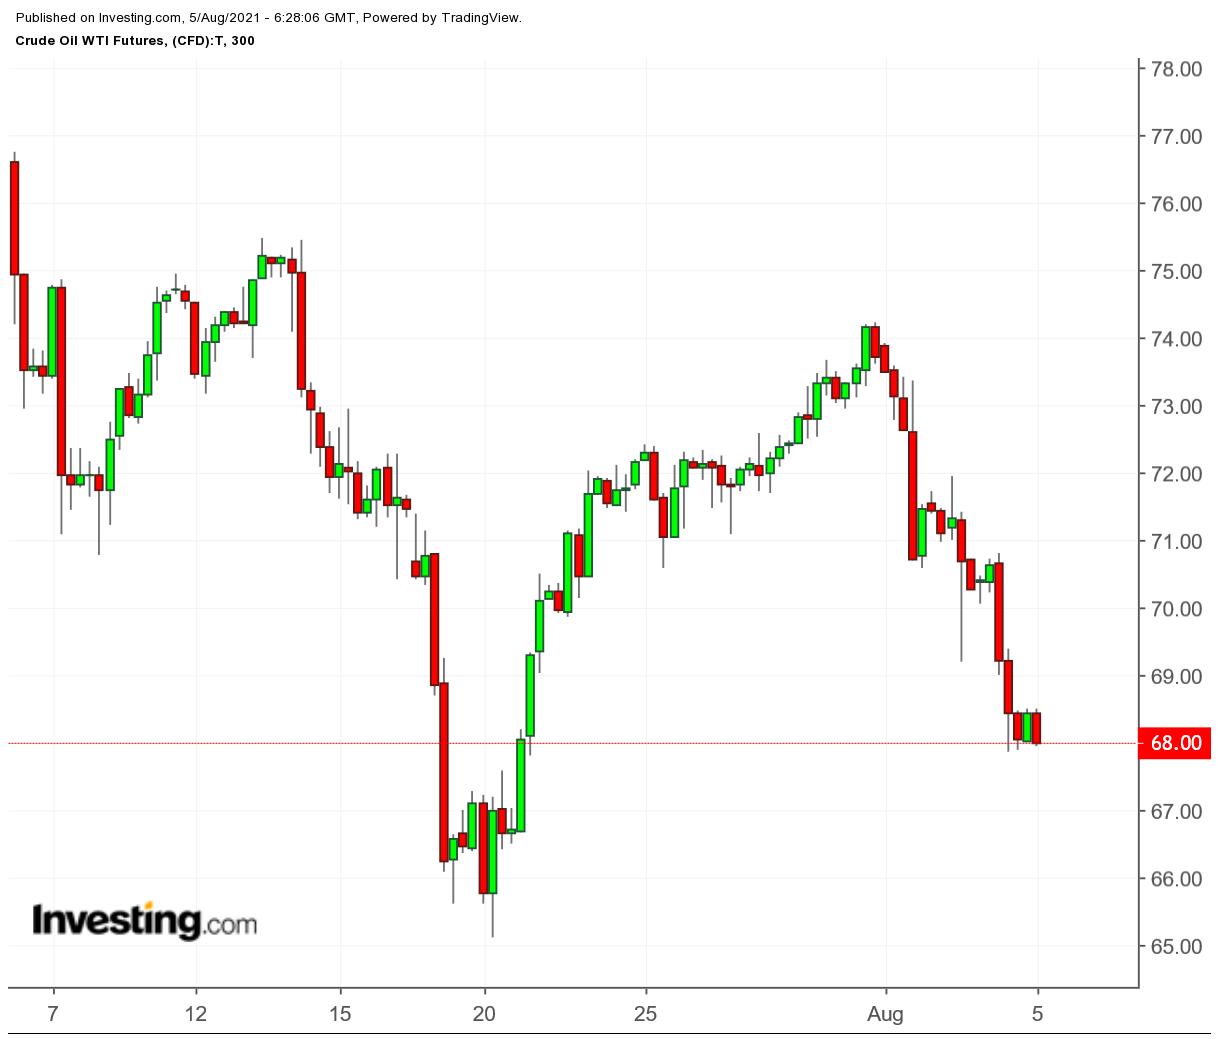 Crude Oil WTI Futures 300 Min Chart